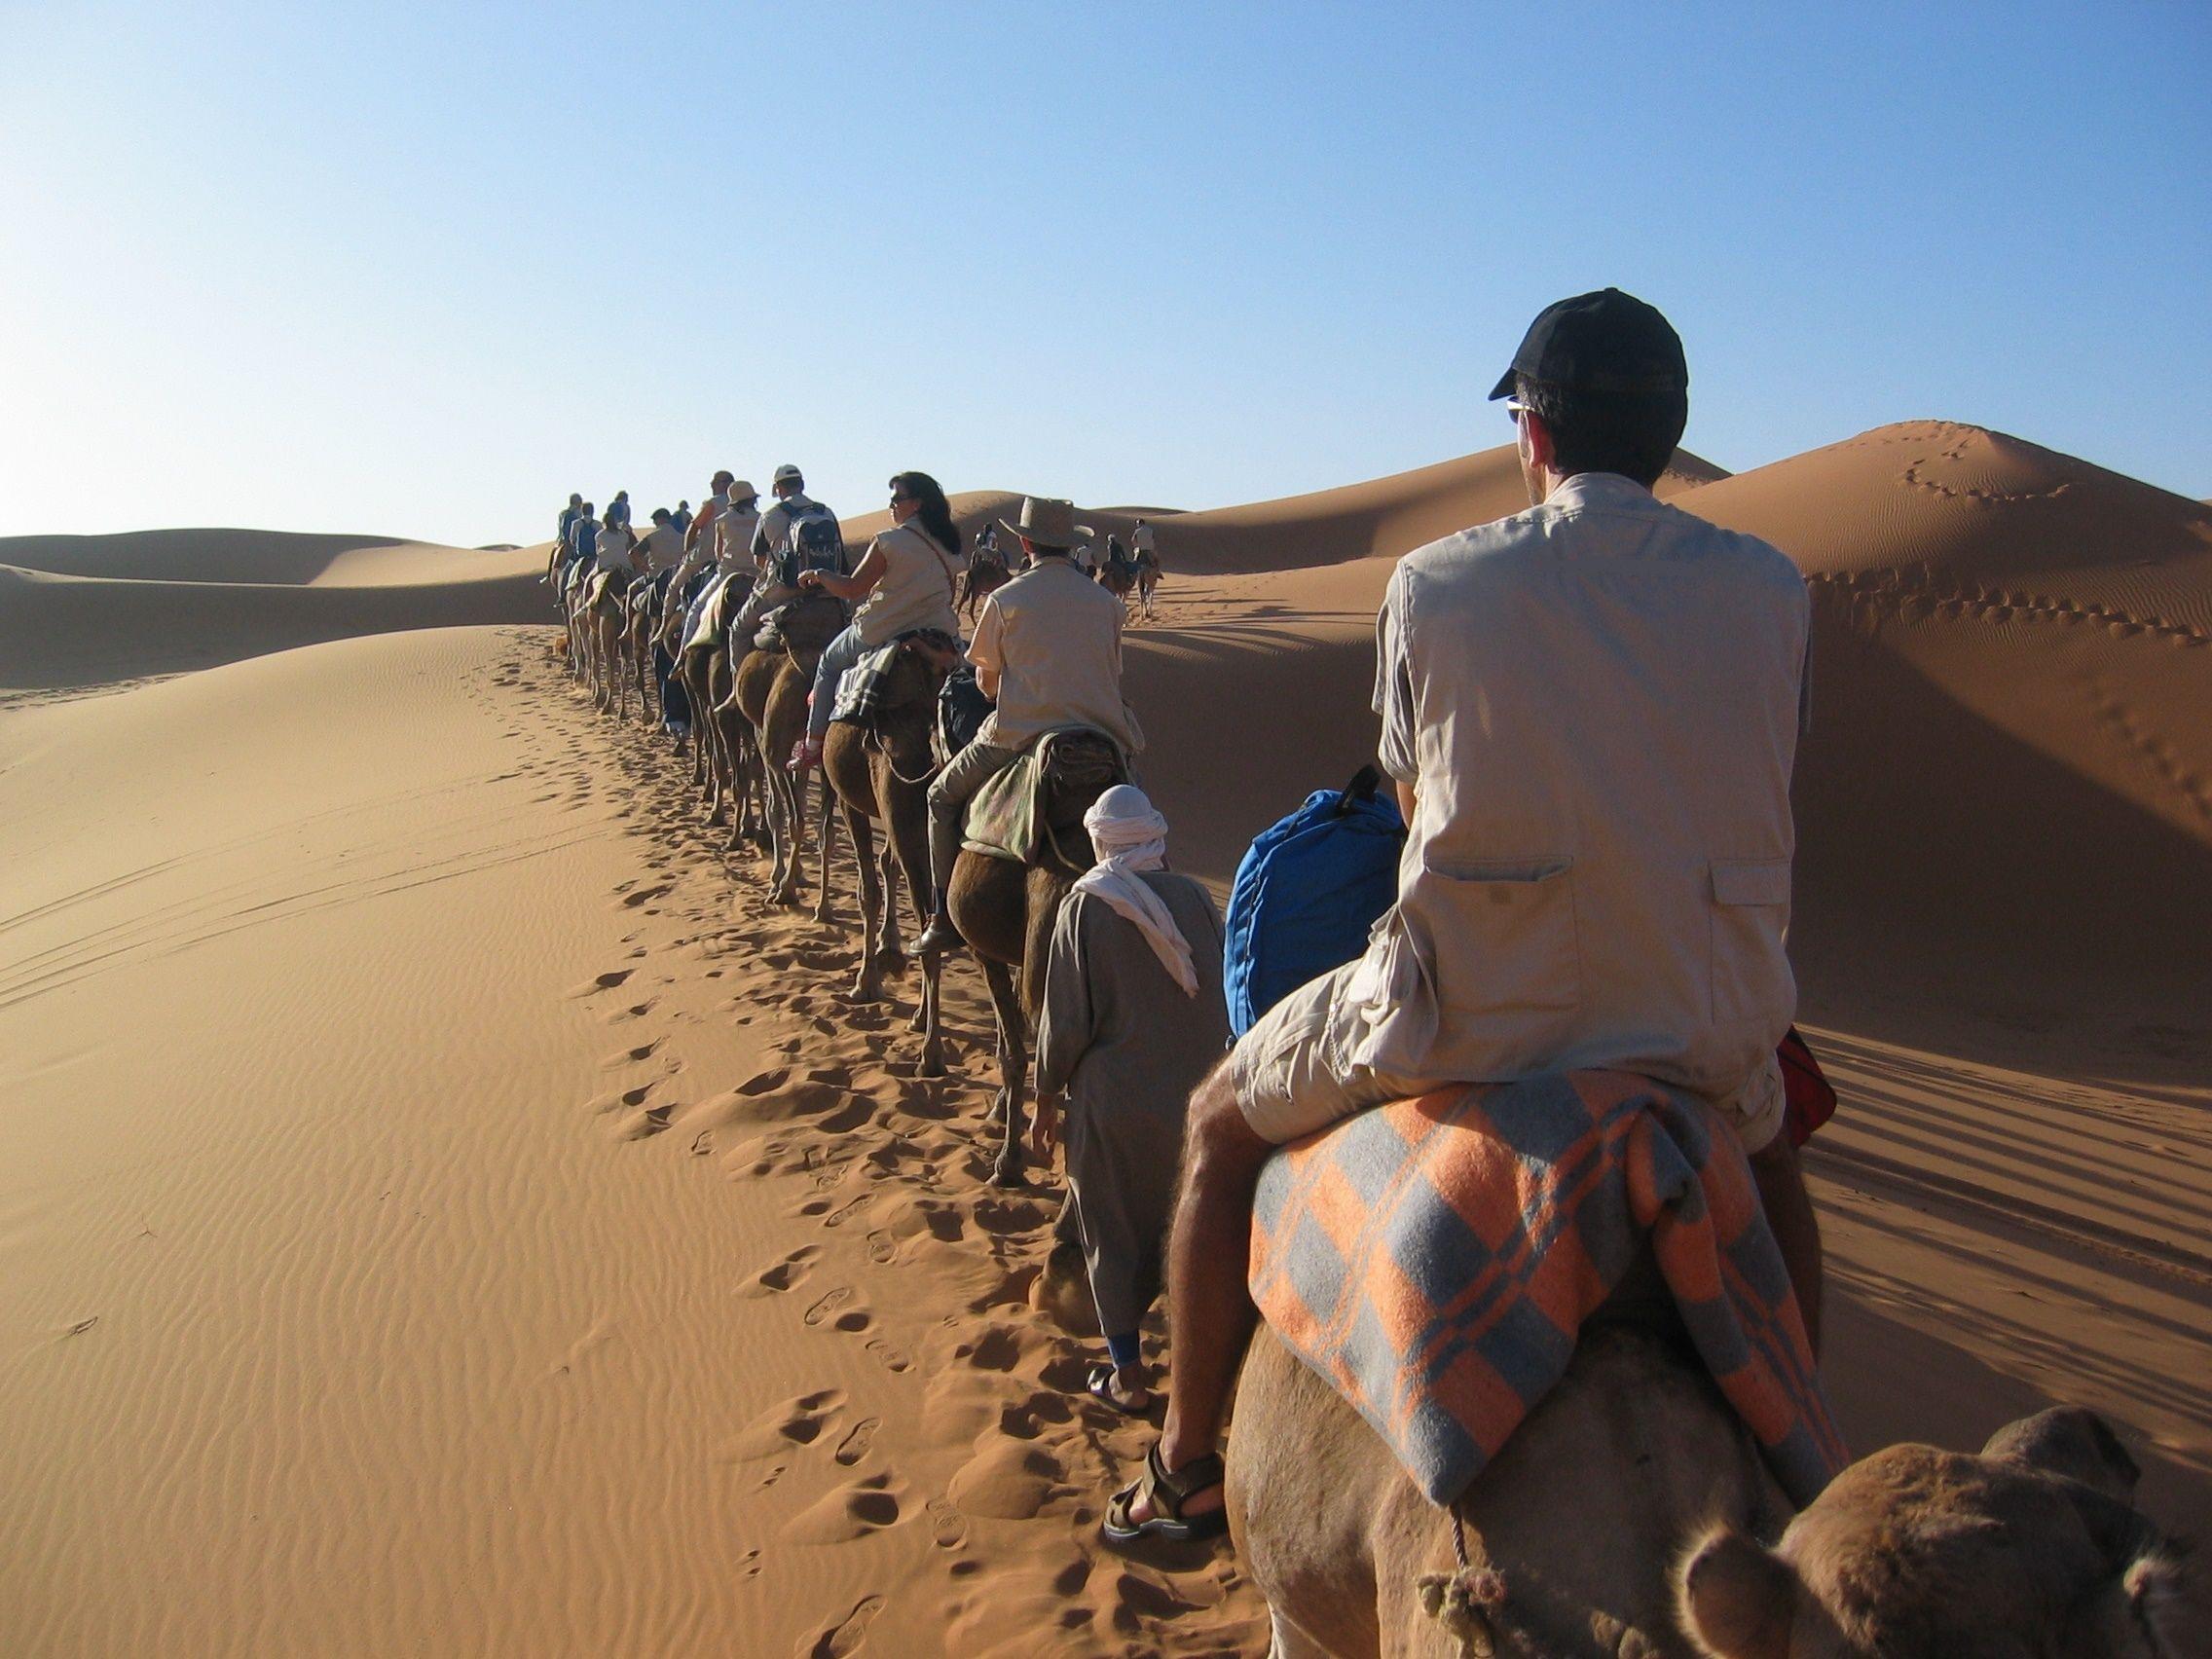 Camino al Oasis de Ouvira, #MTB @BTT